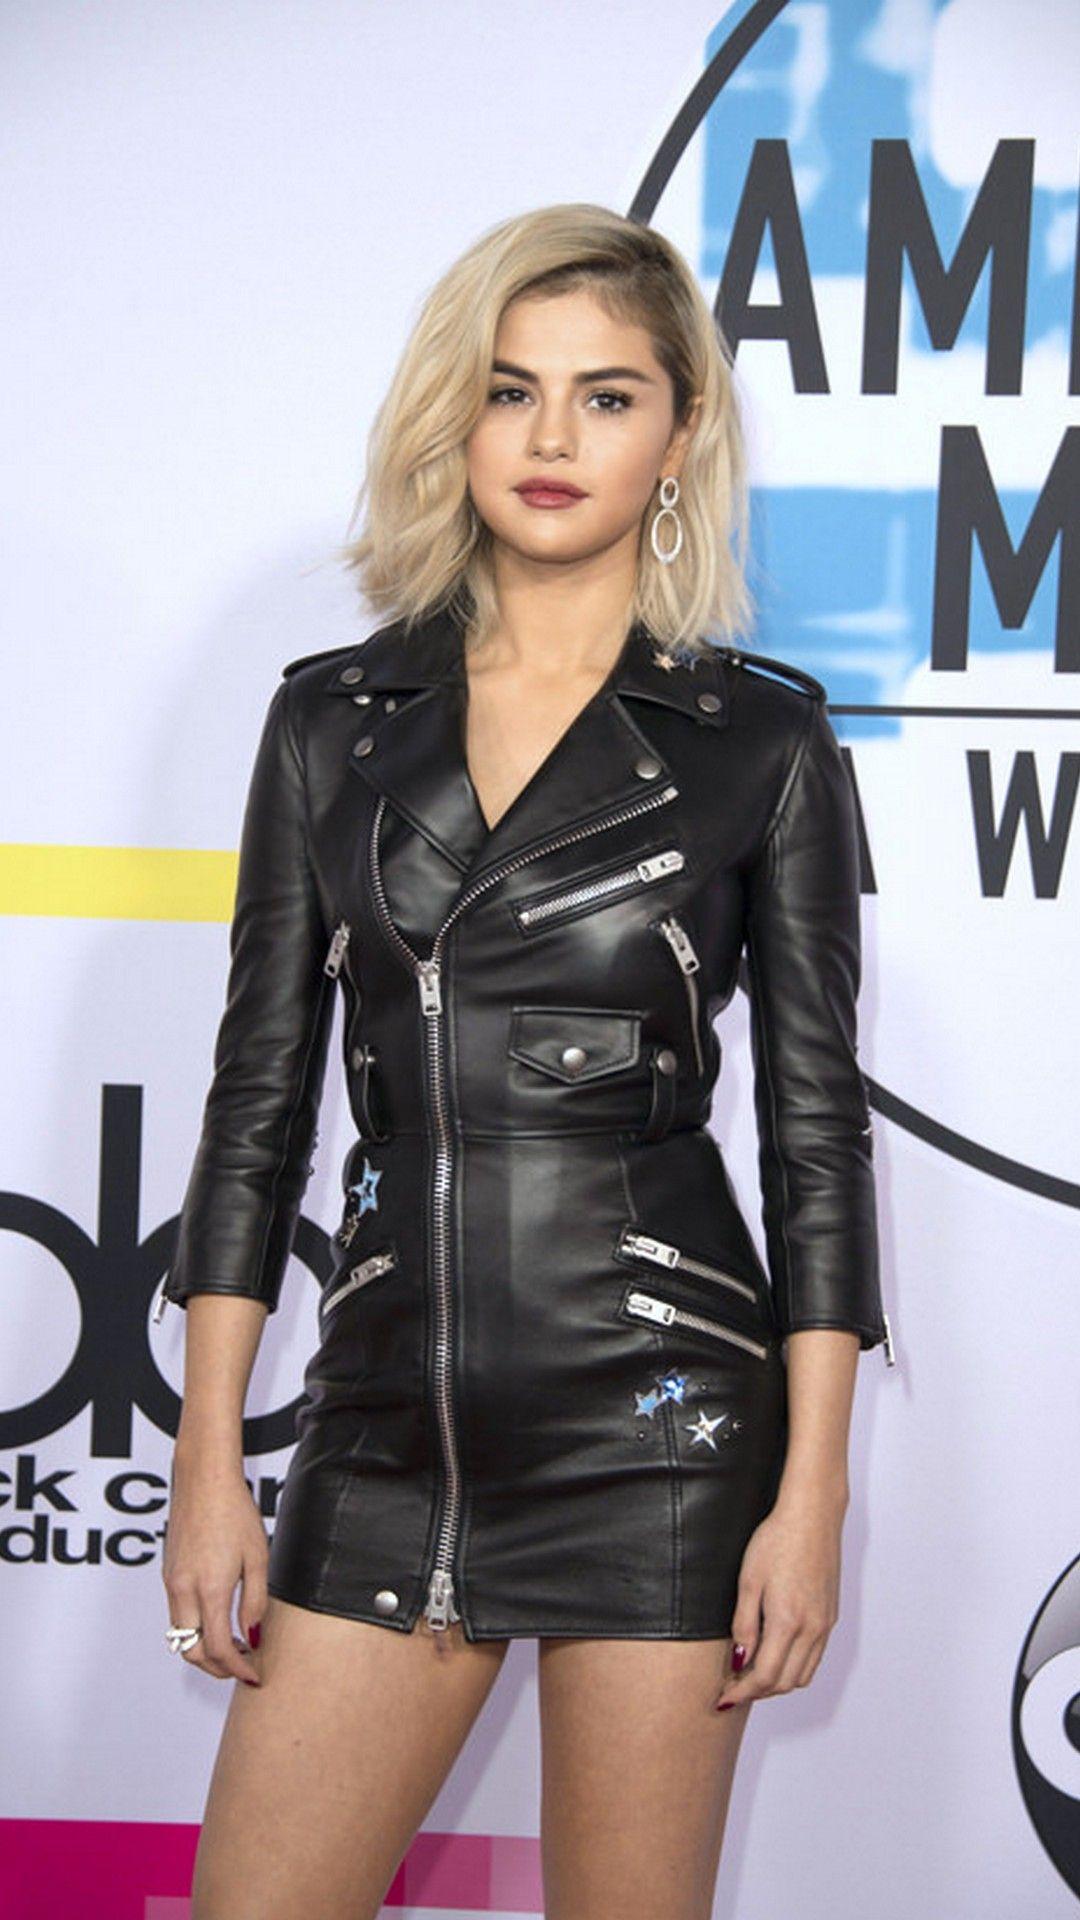 iPhone Wallpaper Selena Gomez Blonde Hair Fashion Selena gomez 1080x1920